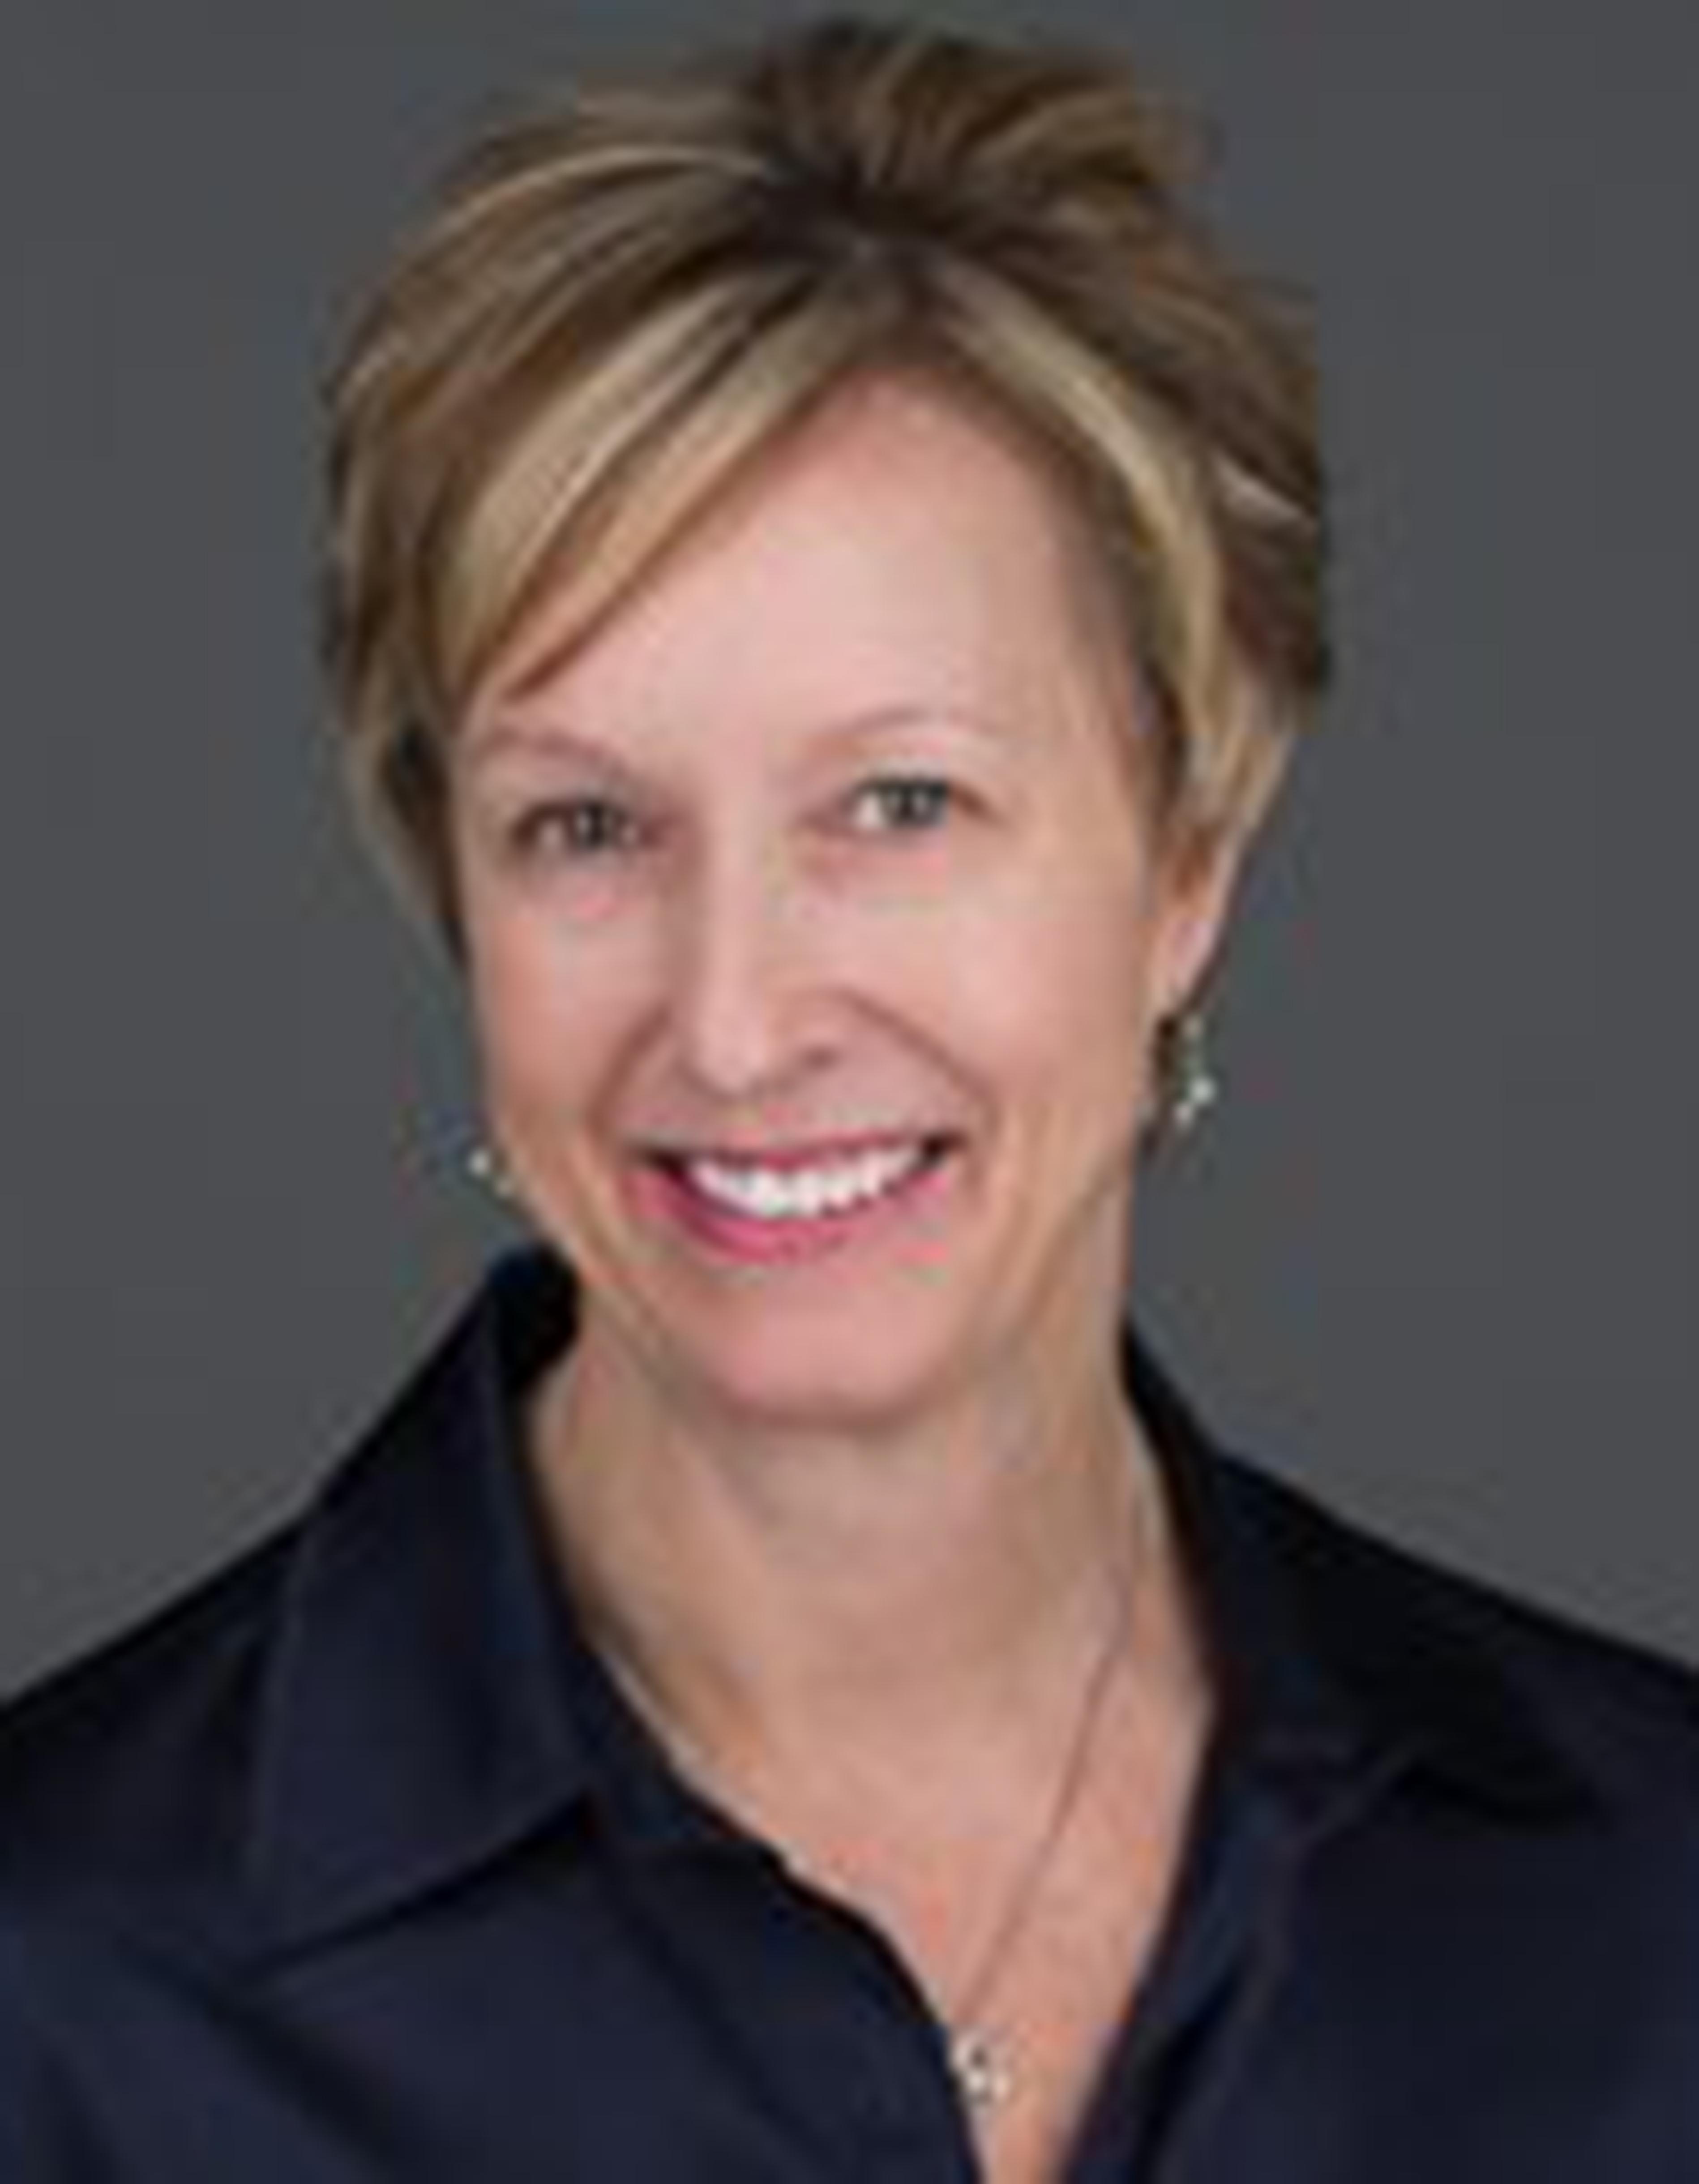 Kathi Halpin